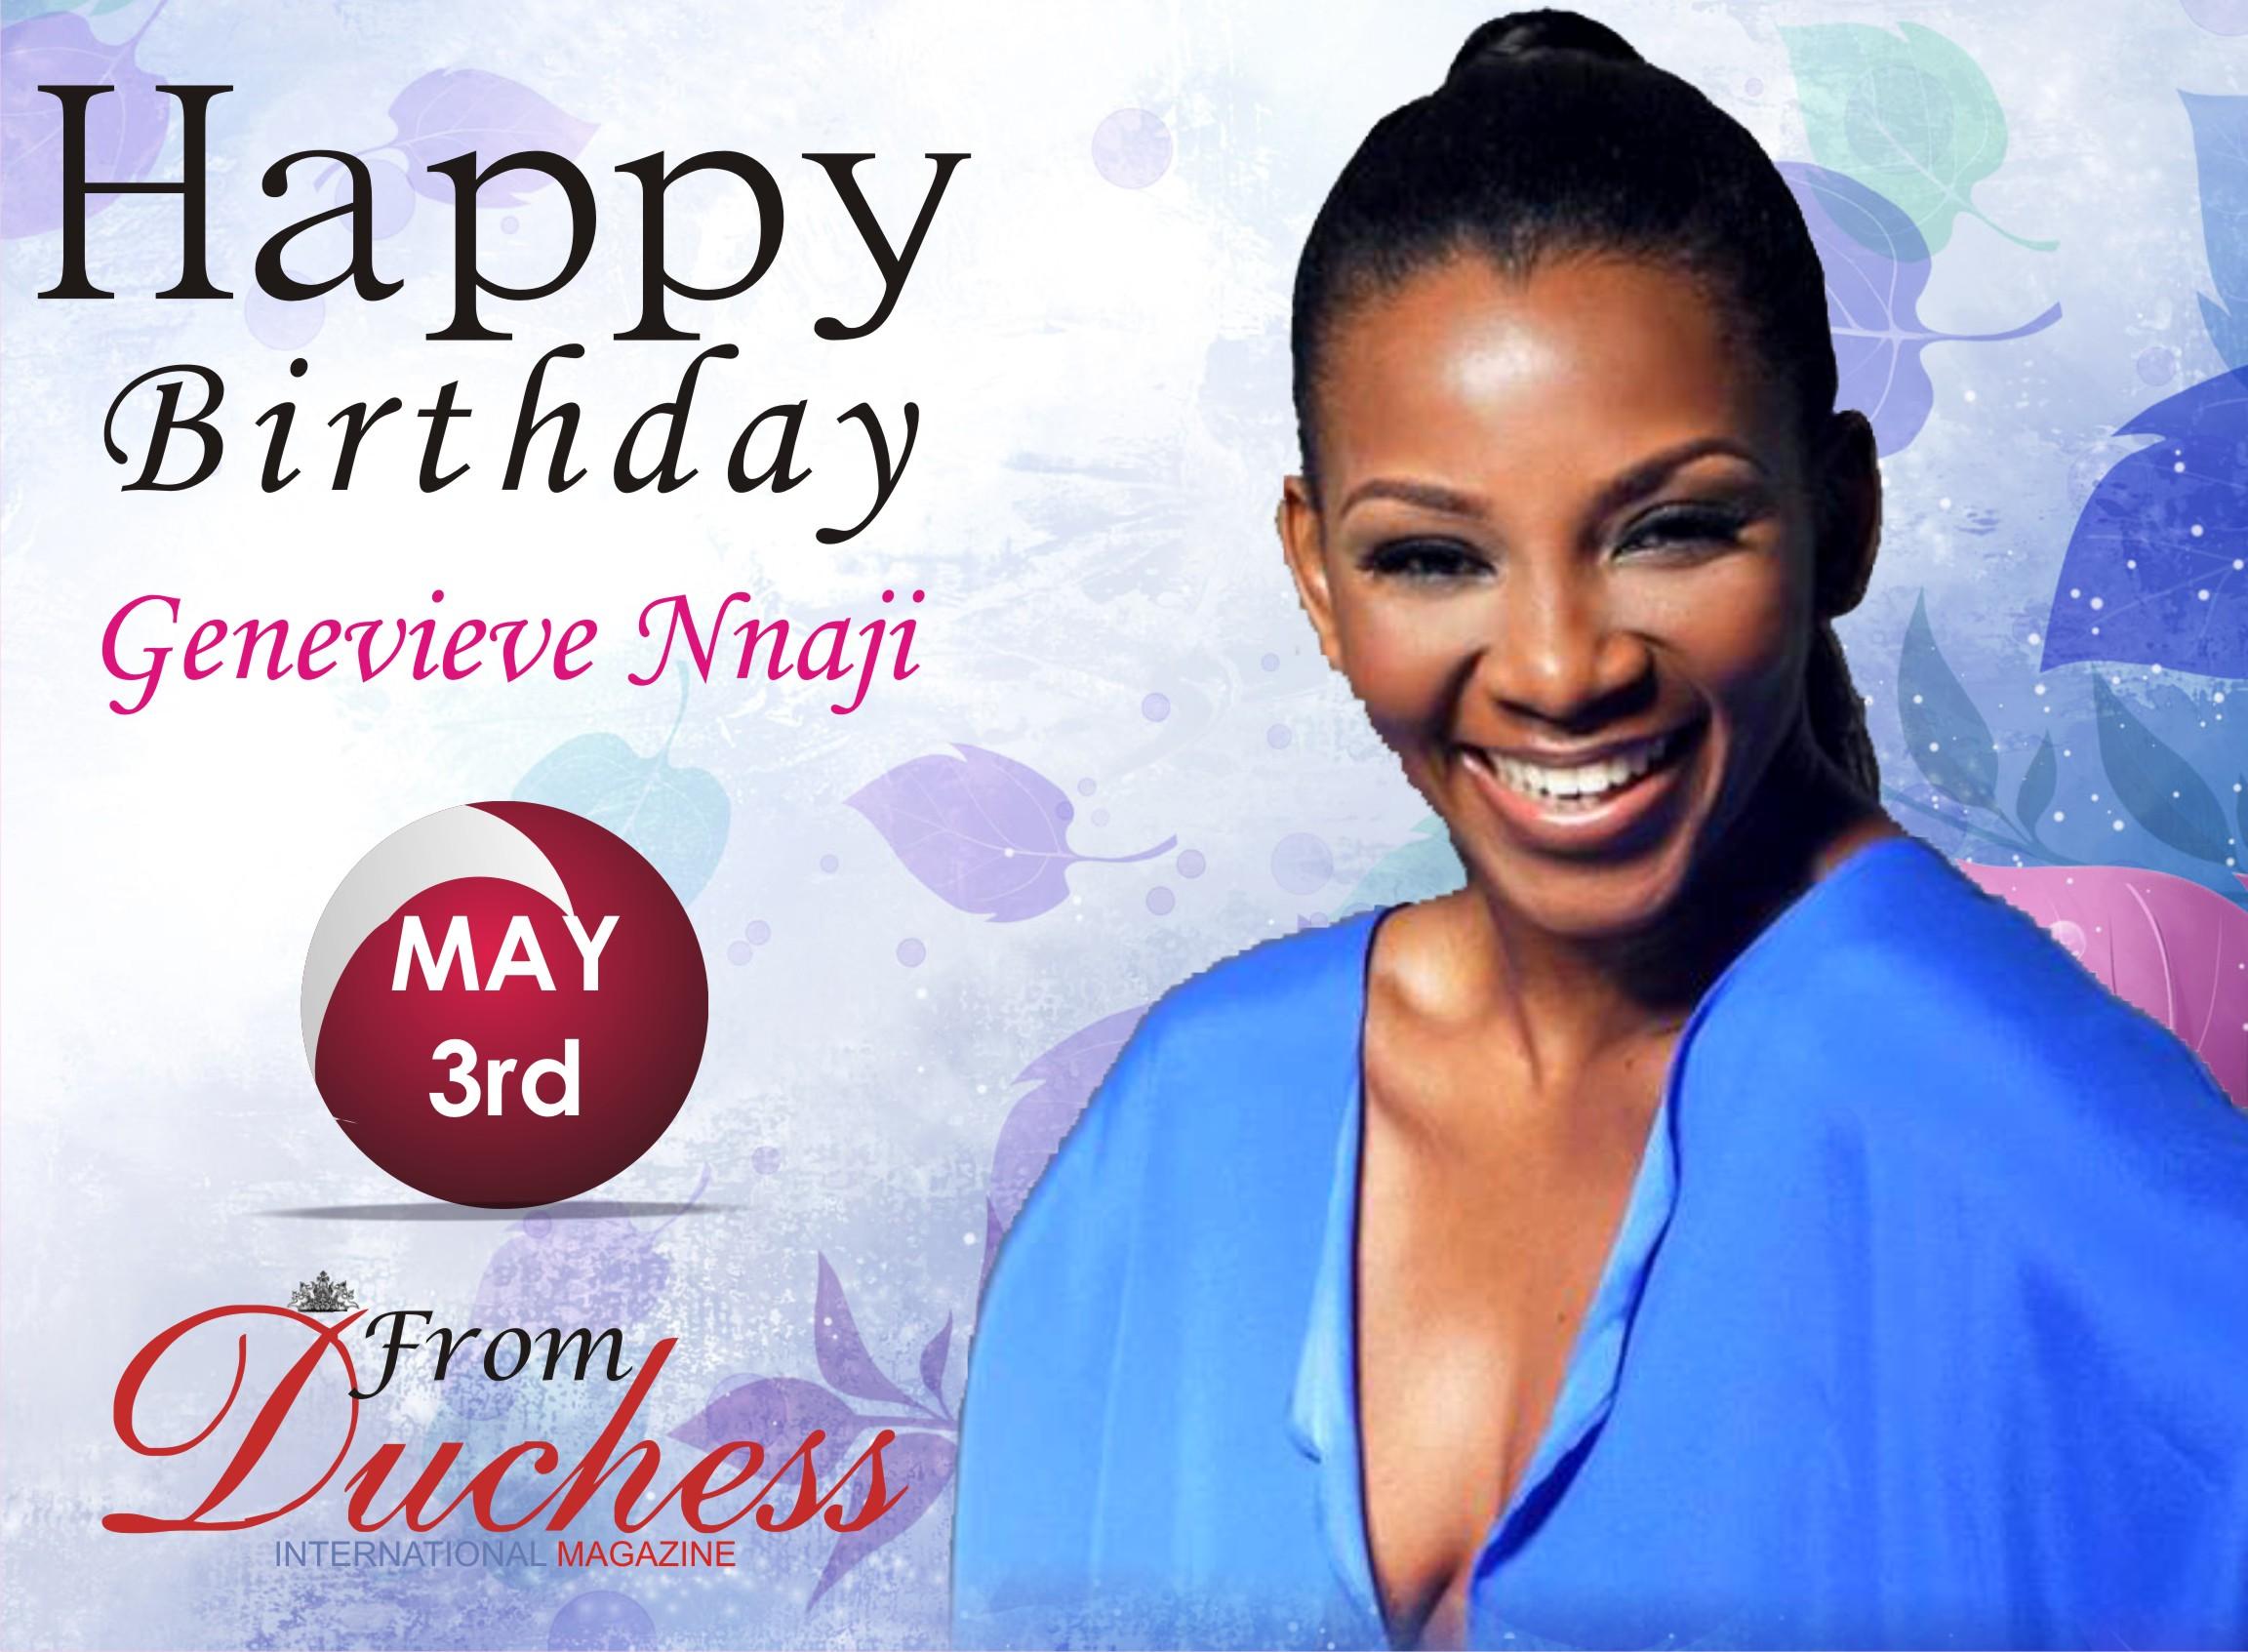 Nolly wood Veteran Actress Genevieve Nnaji is a year Older Today